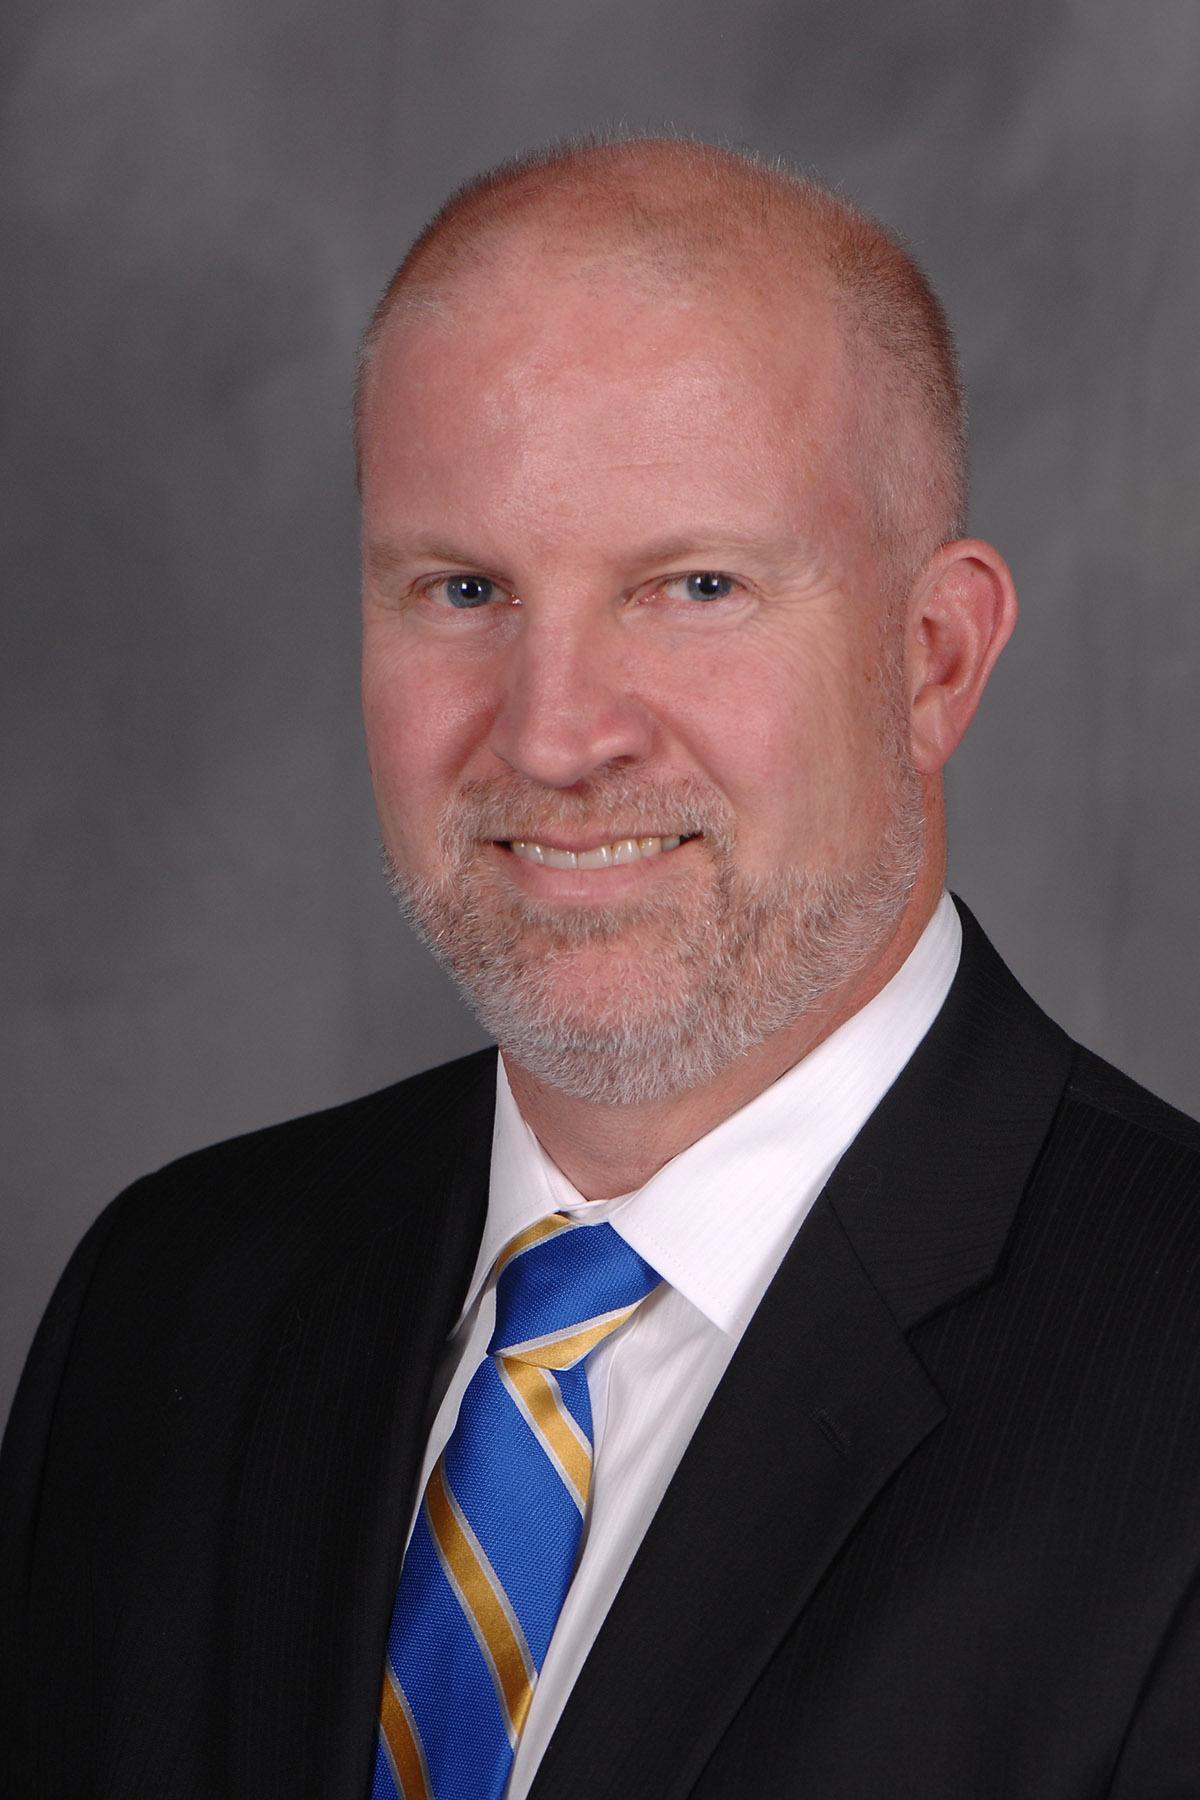 Douglas Delahanty, Associate Vice President, Research Faculty Development